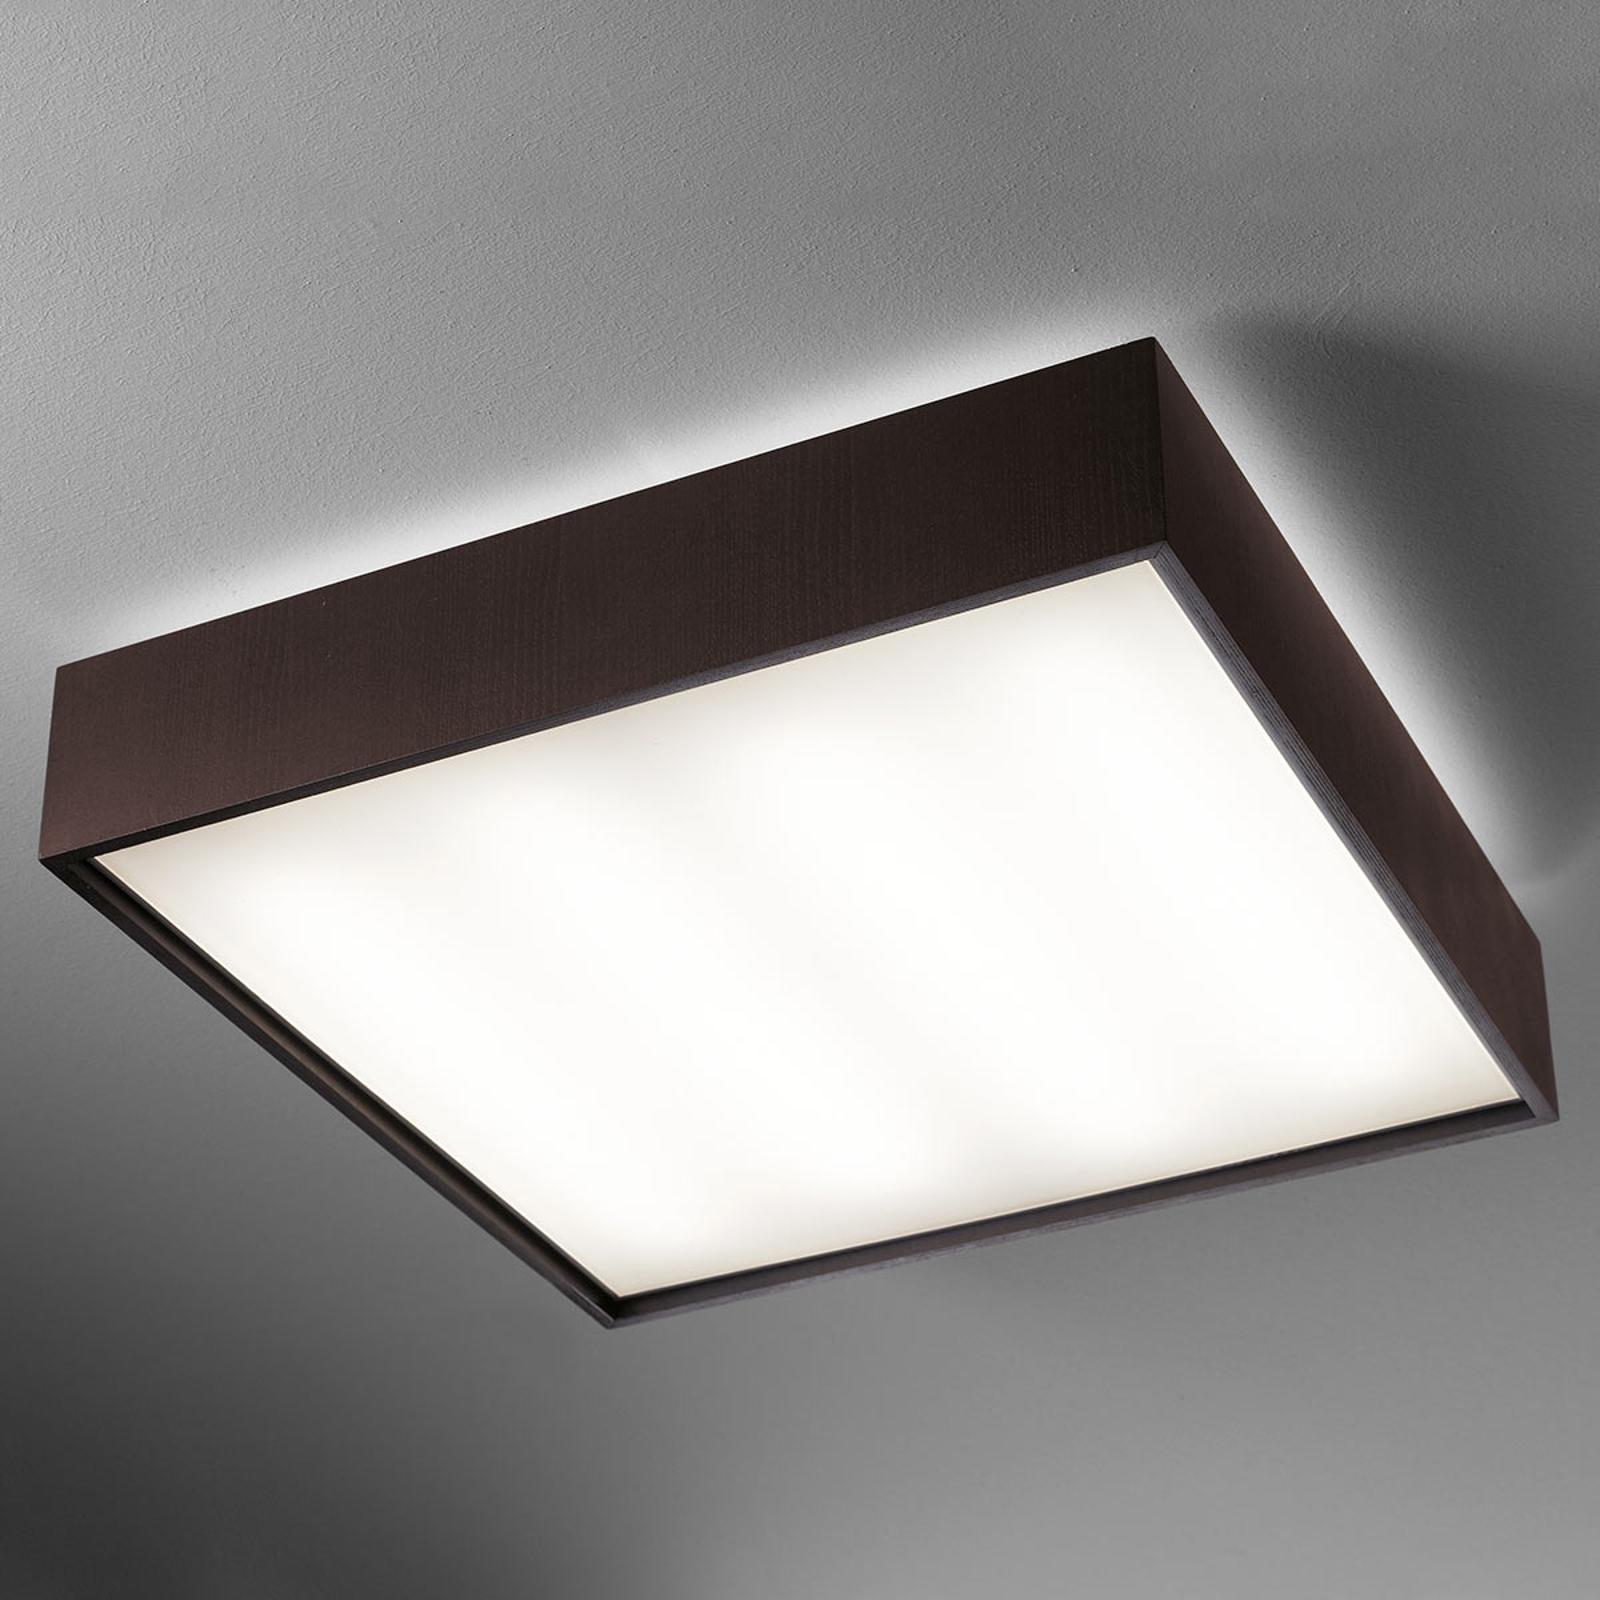 Taklampe Quadrat C med LED 60 x 60, wenge